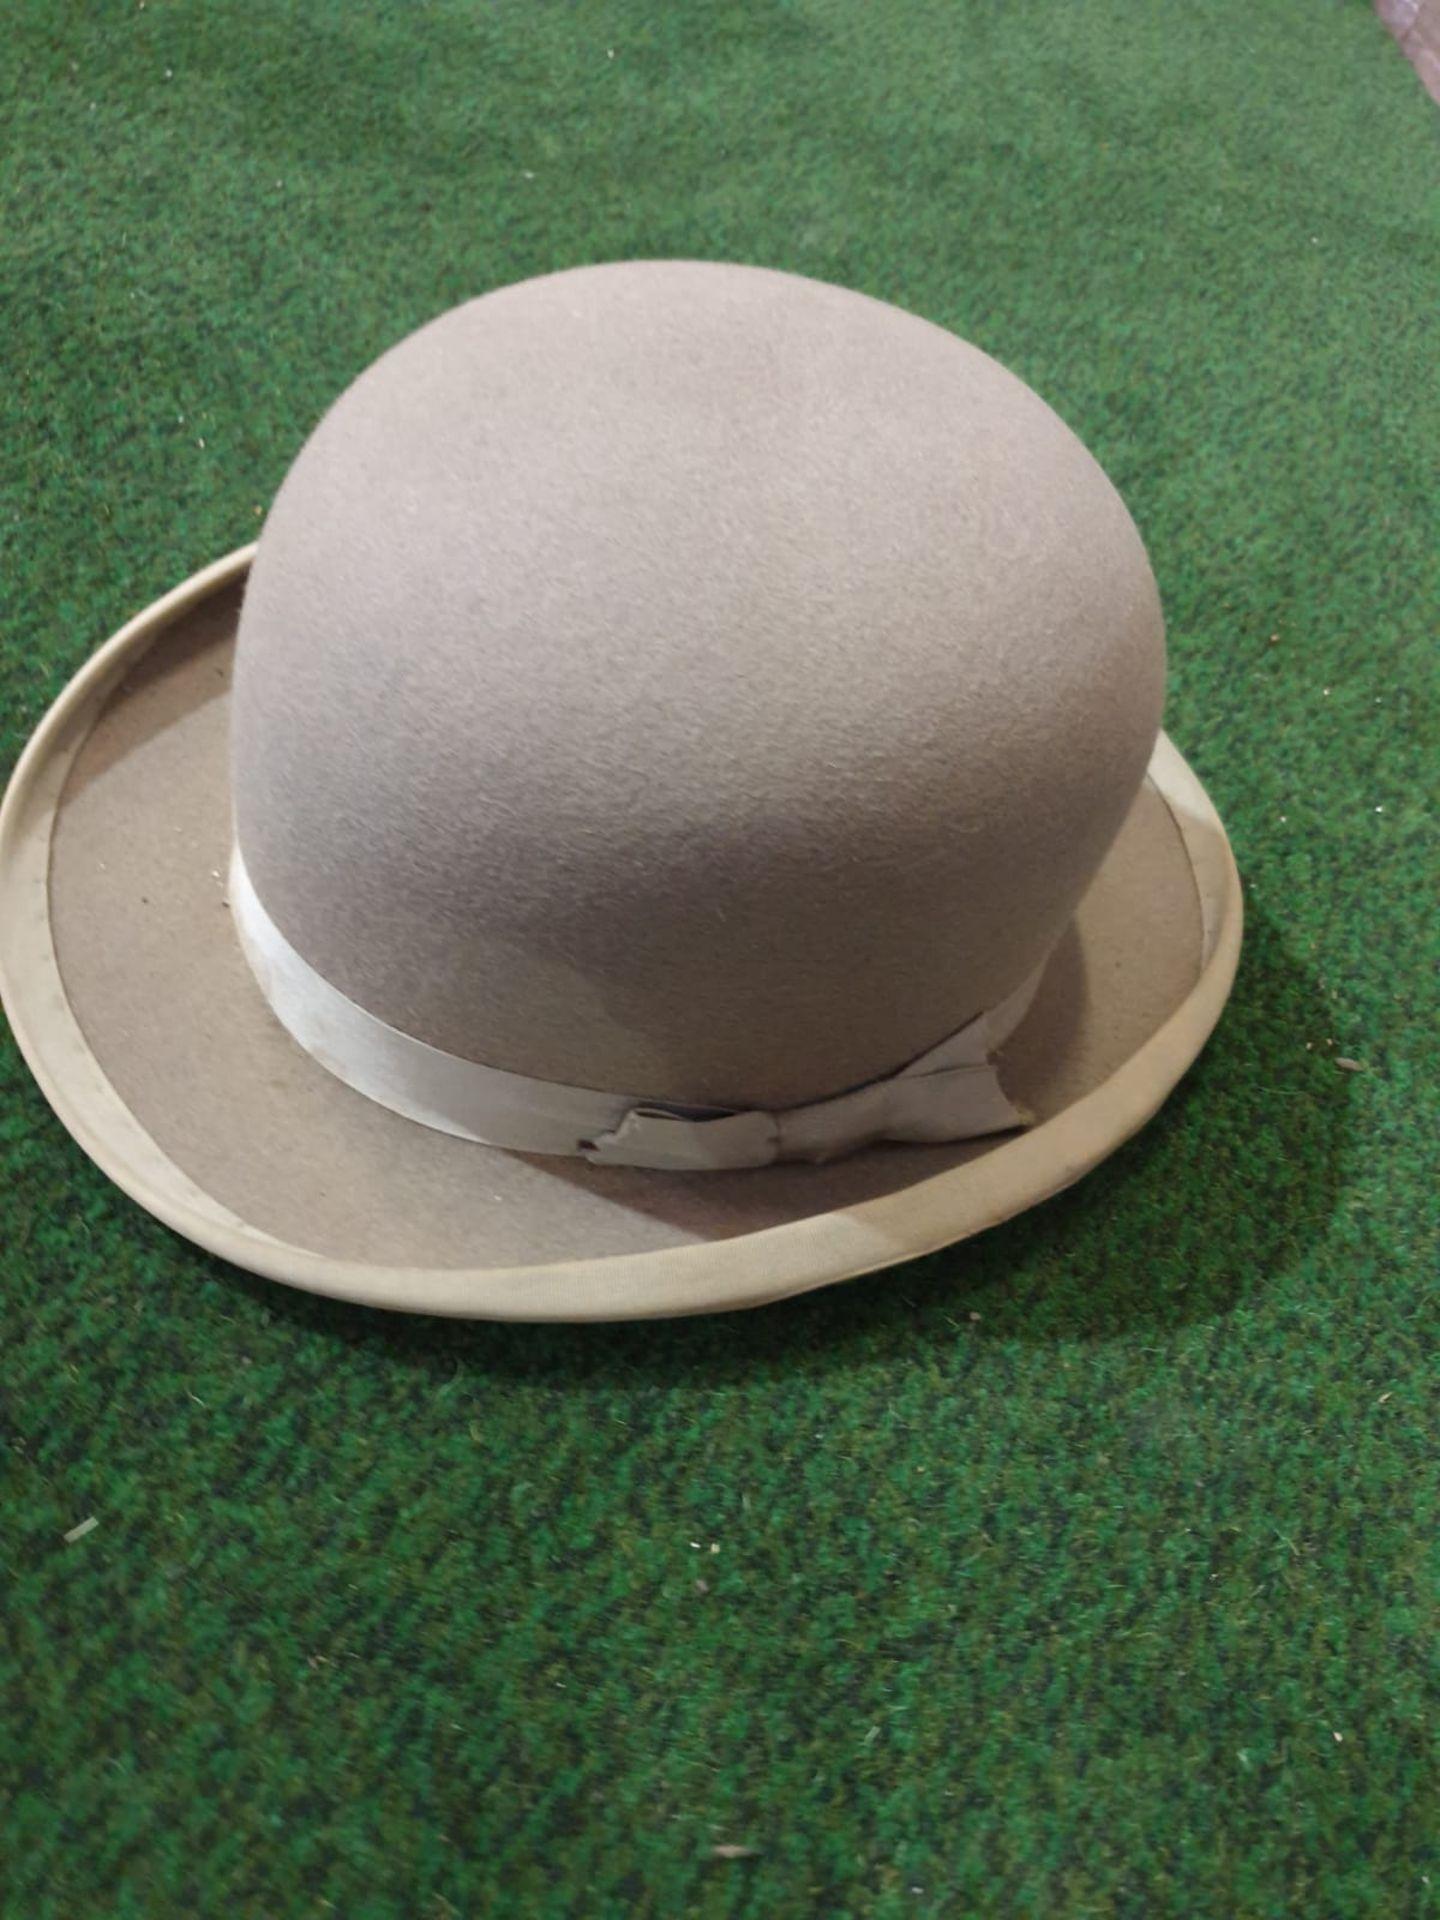 Walter Barnard & Son of Jermyn Street London Grey Bowler hat with cardboard box - Image 2 of 4